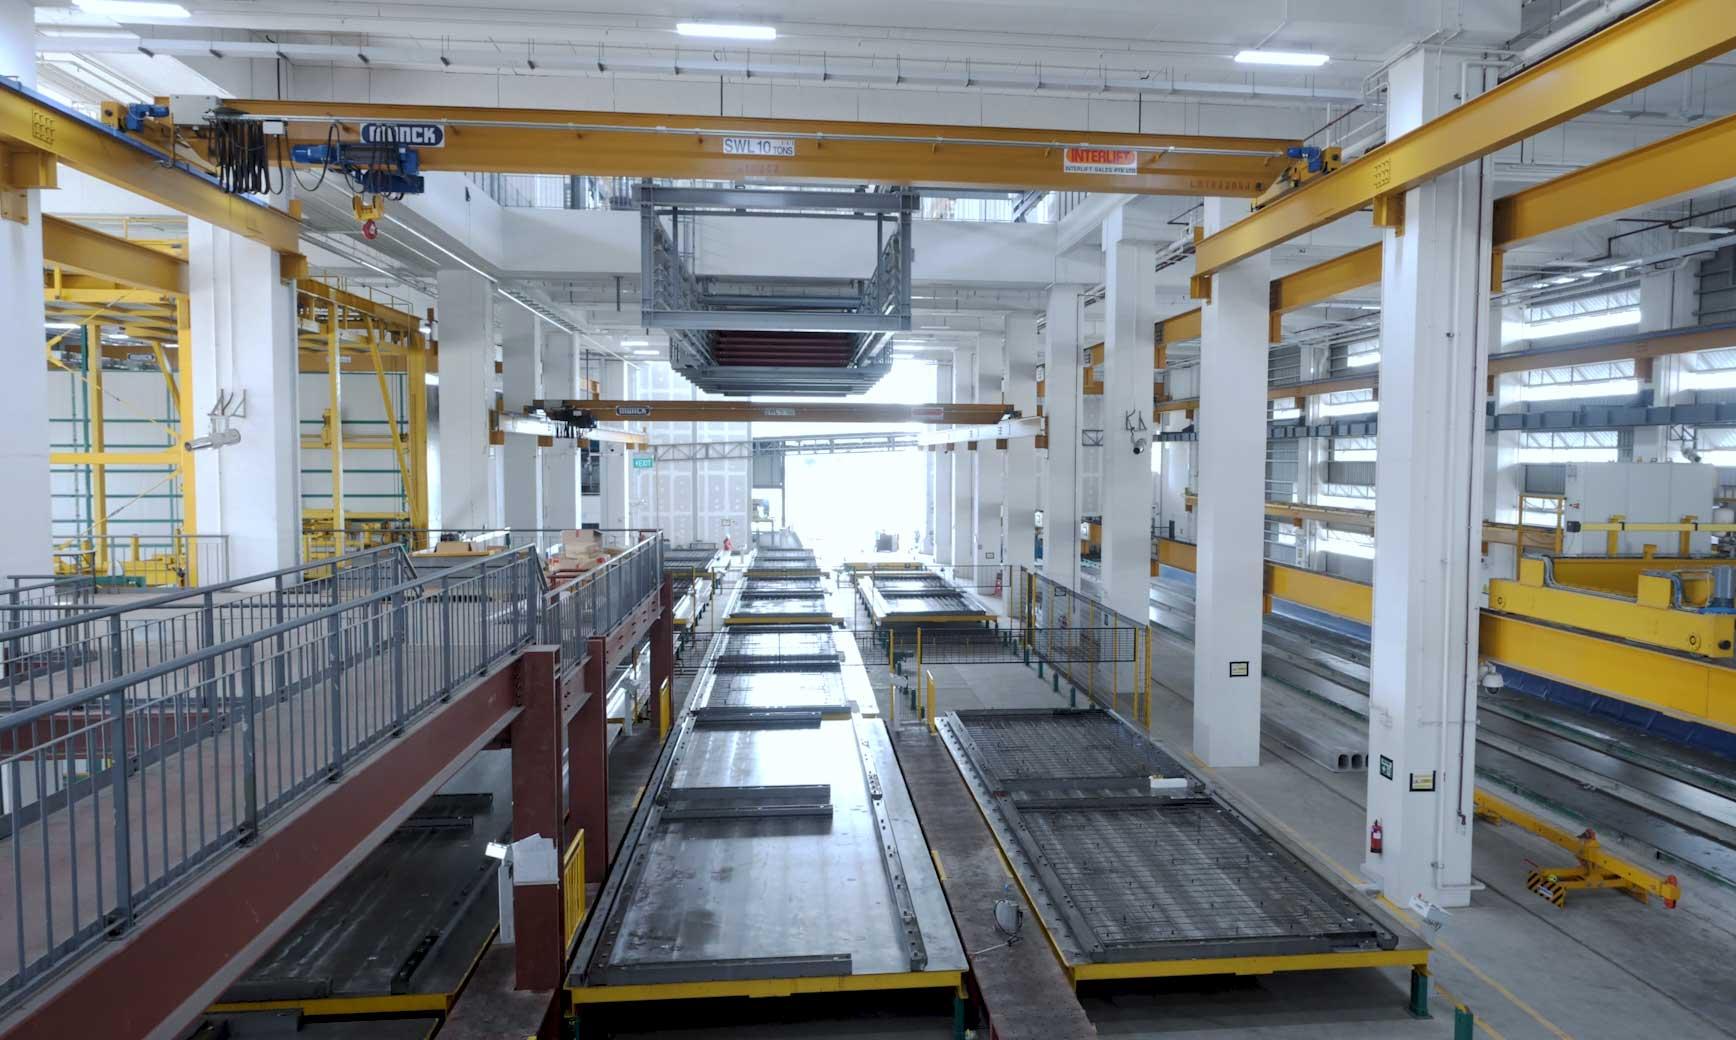 Soilbuild - Automated production facility